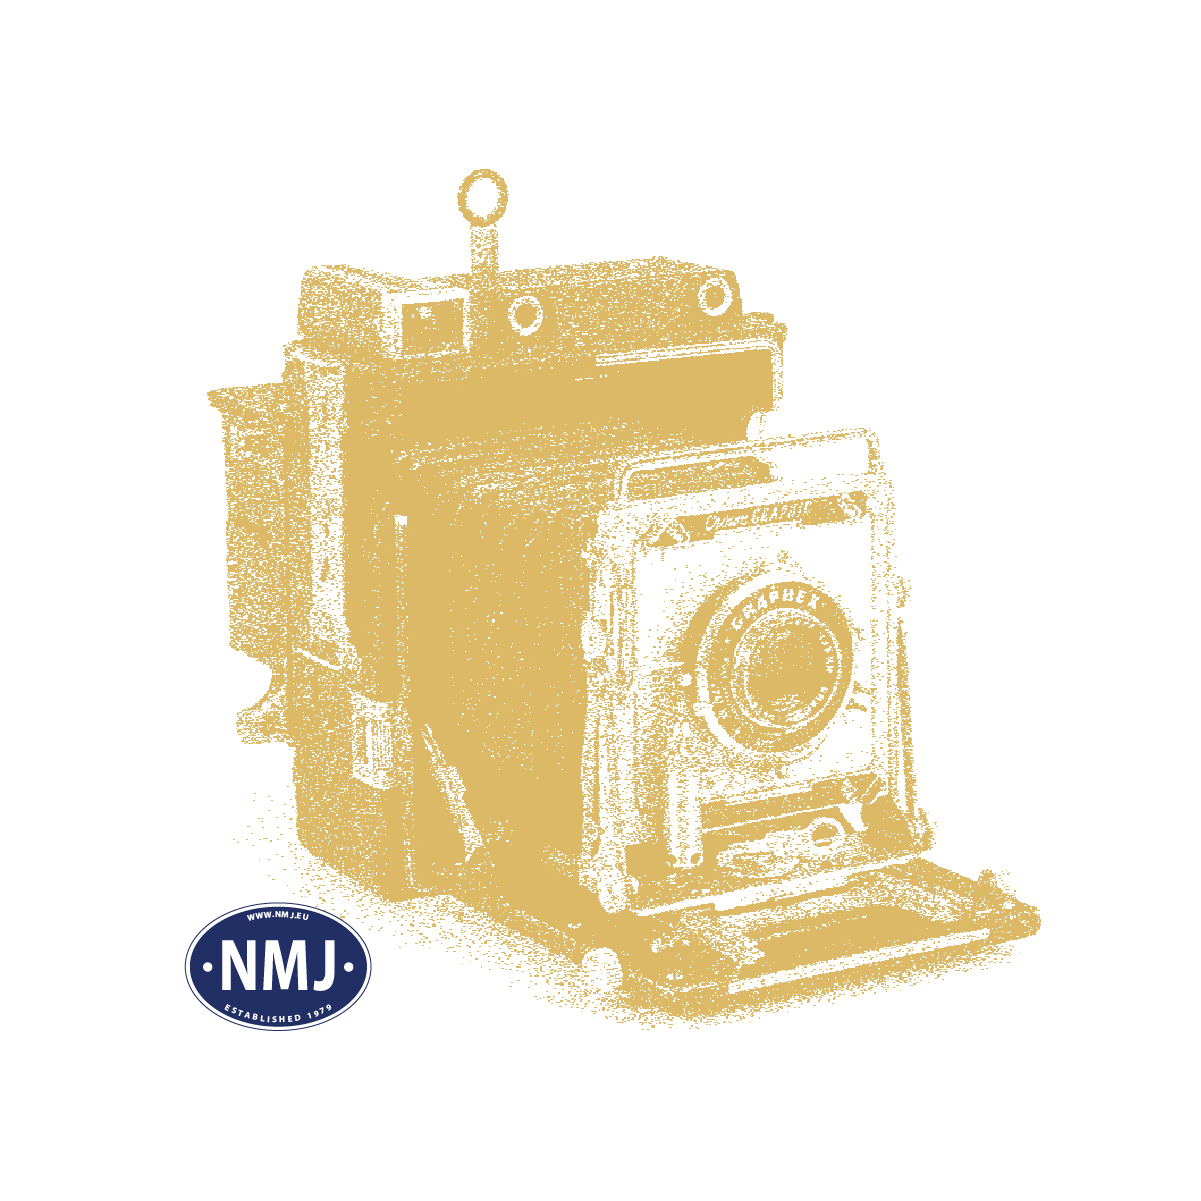 NMJT90604 - NMJ Topline CLR V170 1151, DCC m/ Sound